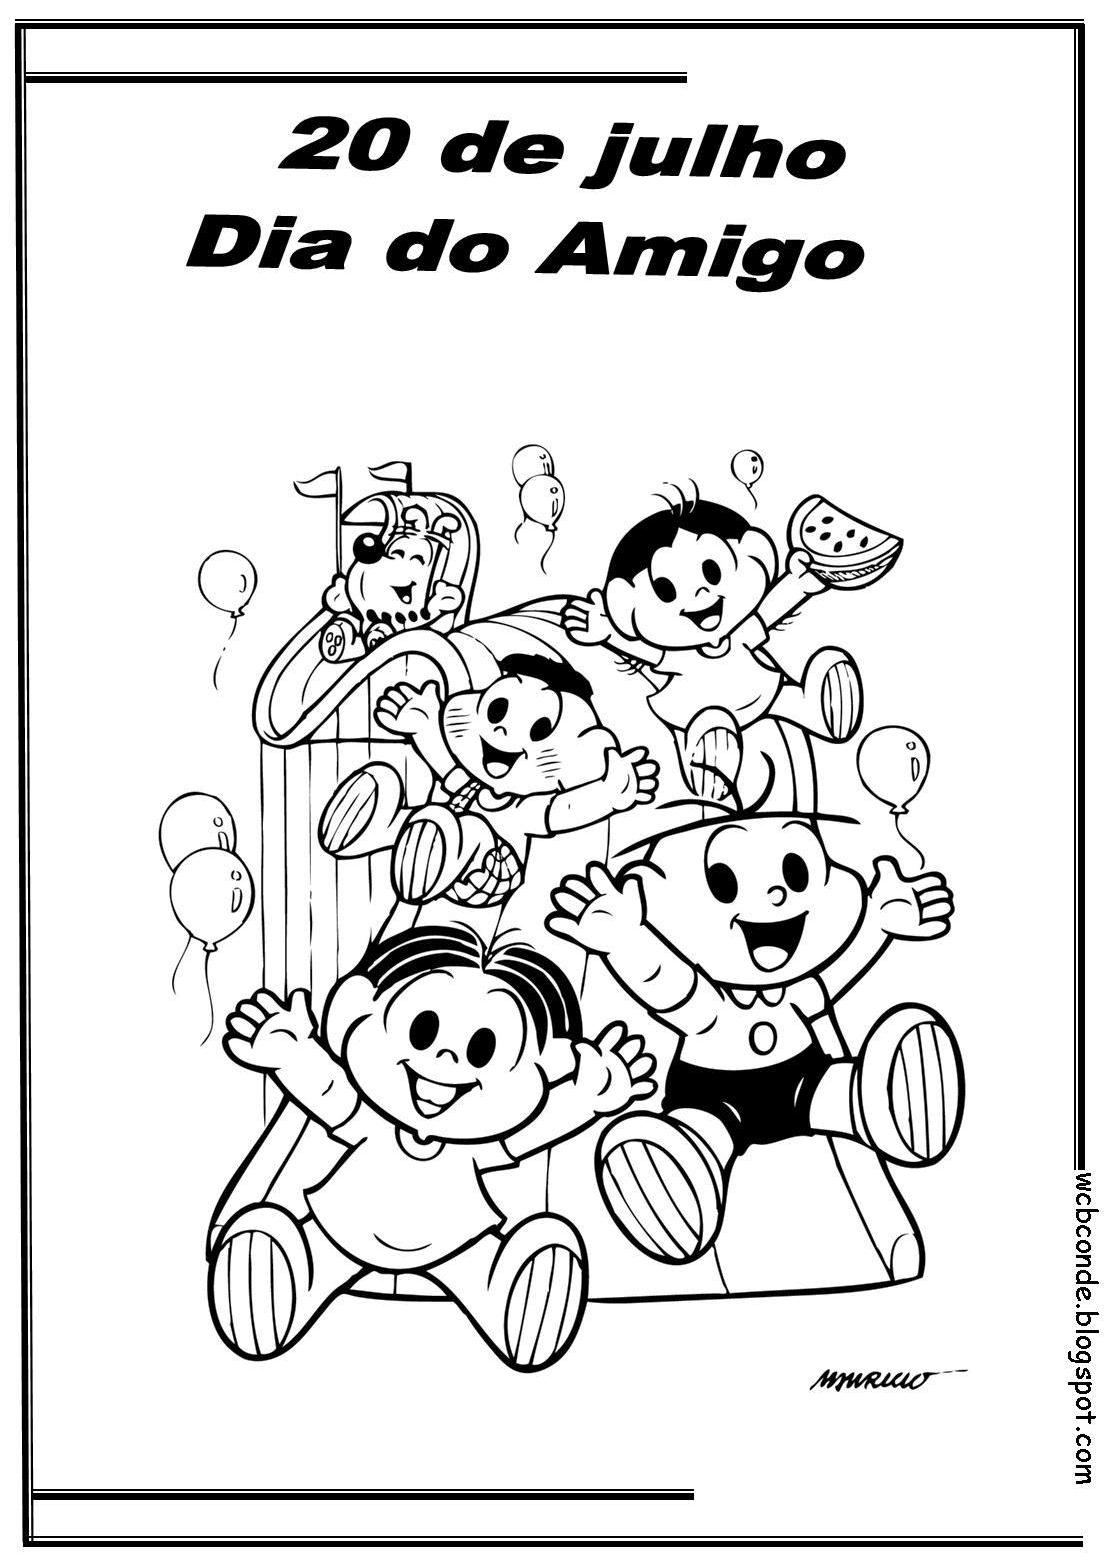 Unidade Escolar Walter De Carvalho Baptista Educando Para A Vida